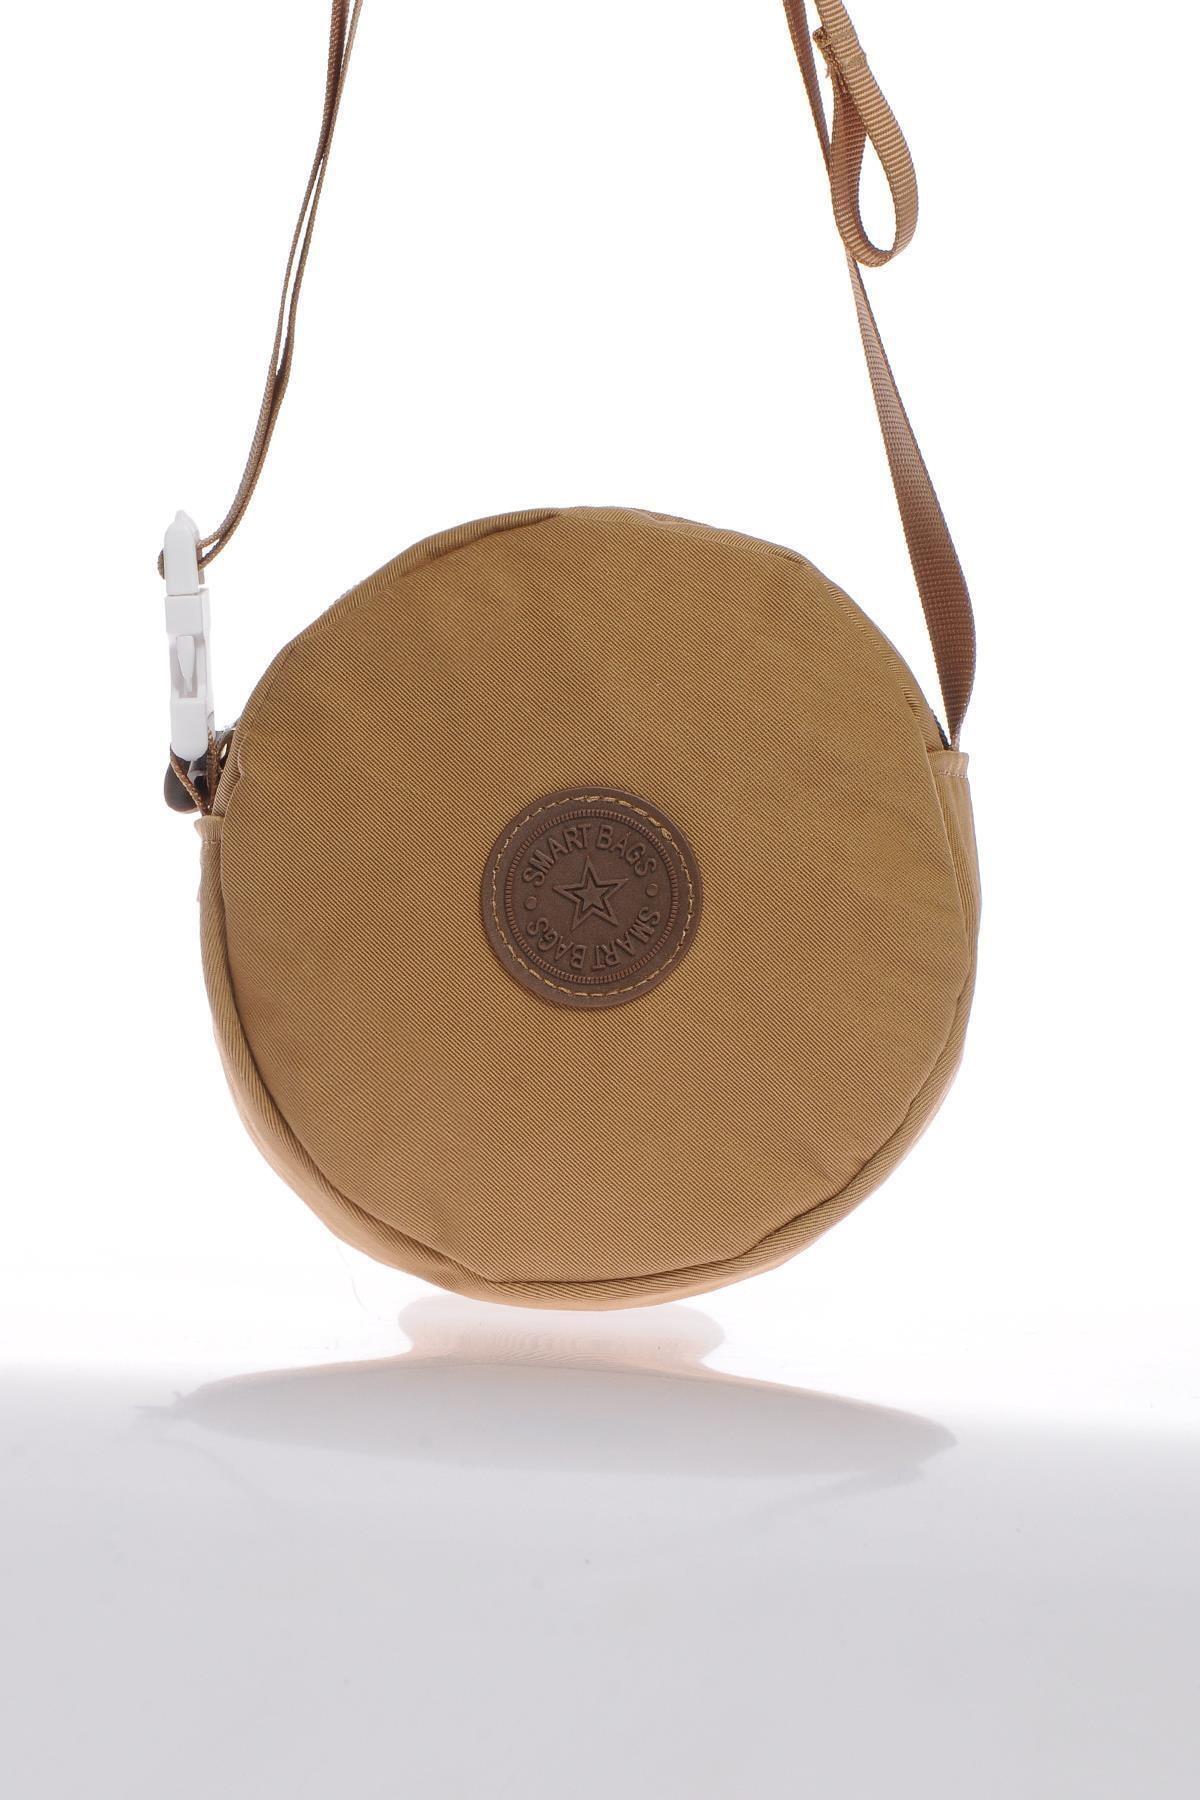 SMART BAGS Smb6001-0110 Taba Kadın Minik Çapraz Çanta 1